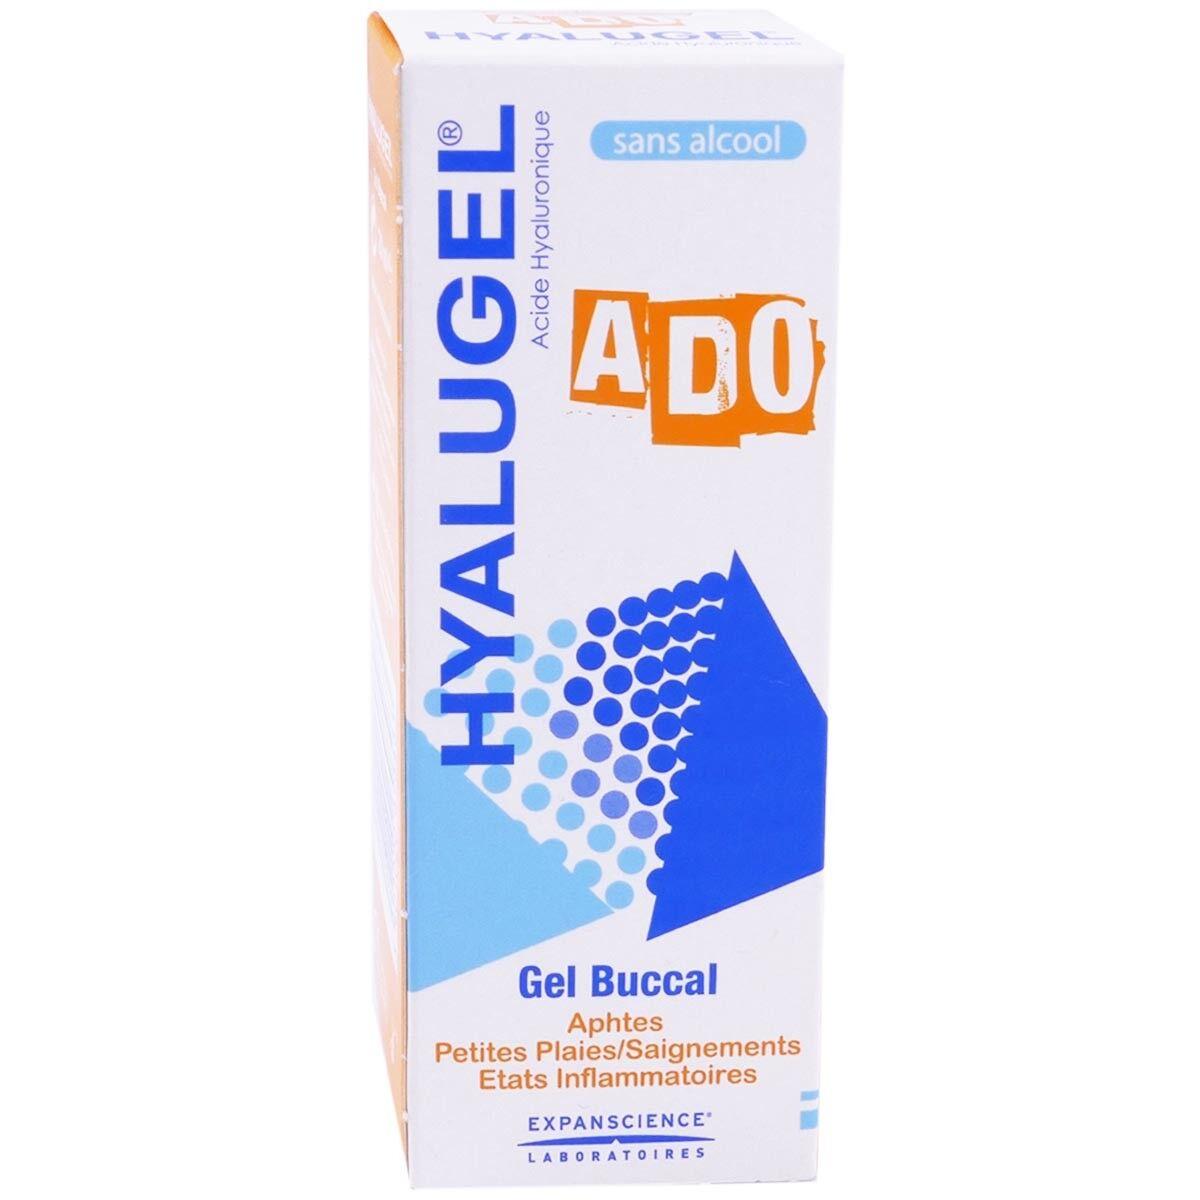 EXPANSCIENCE Hyalugel ado gel buccal 20ml